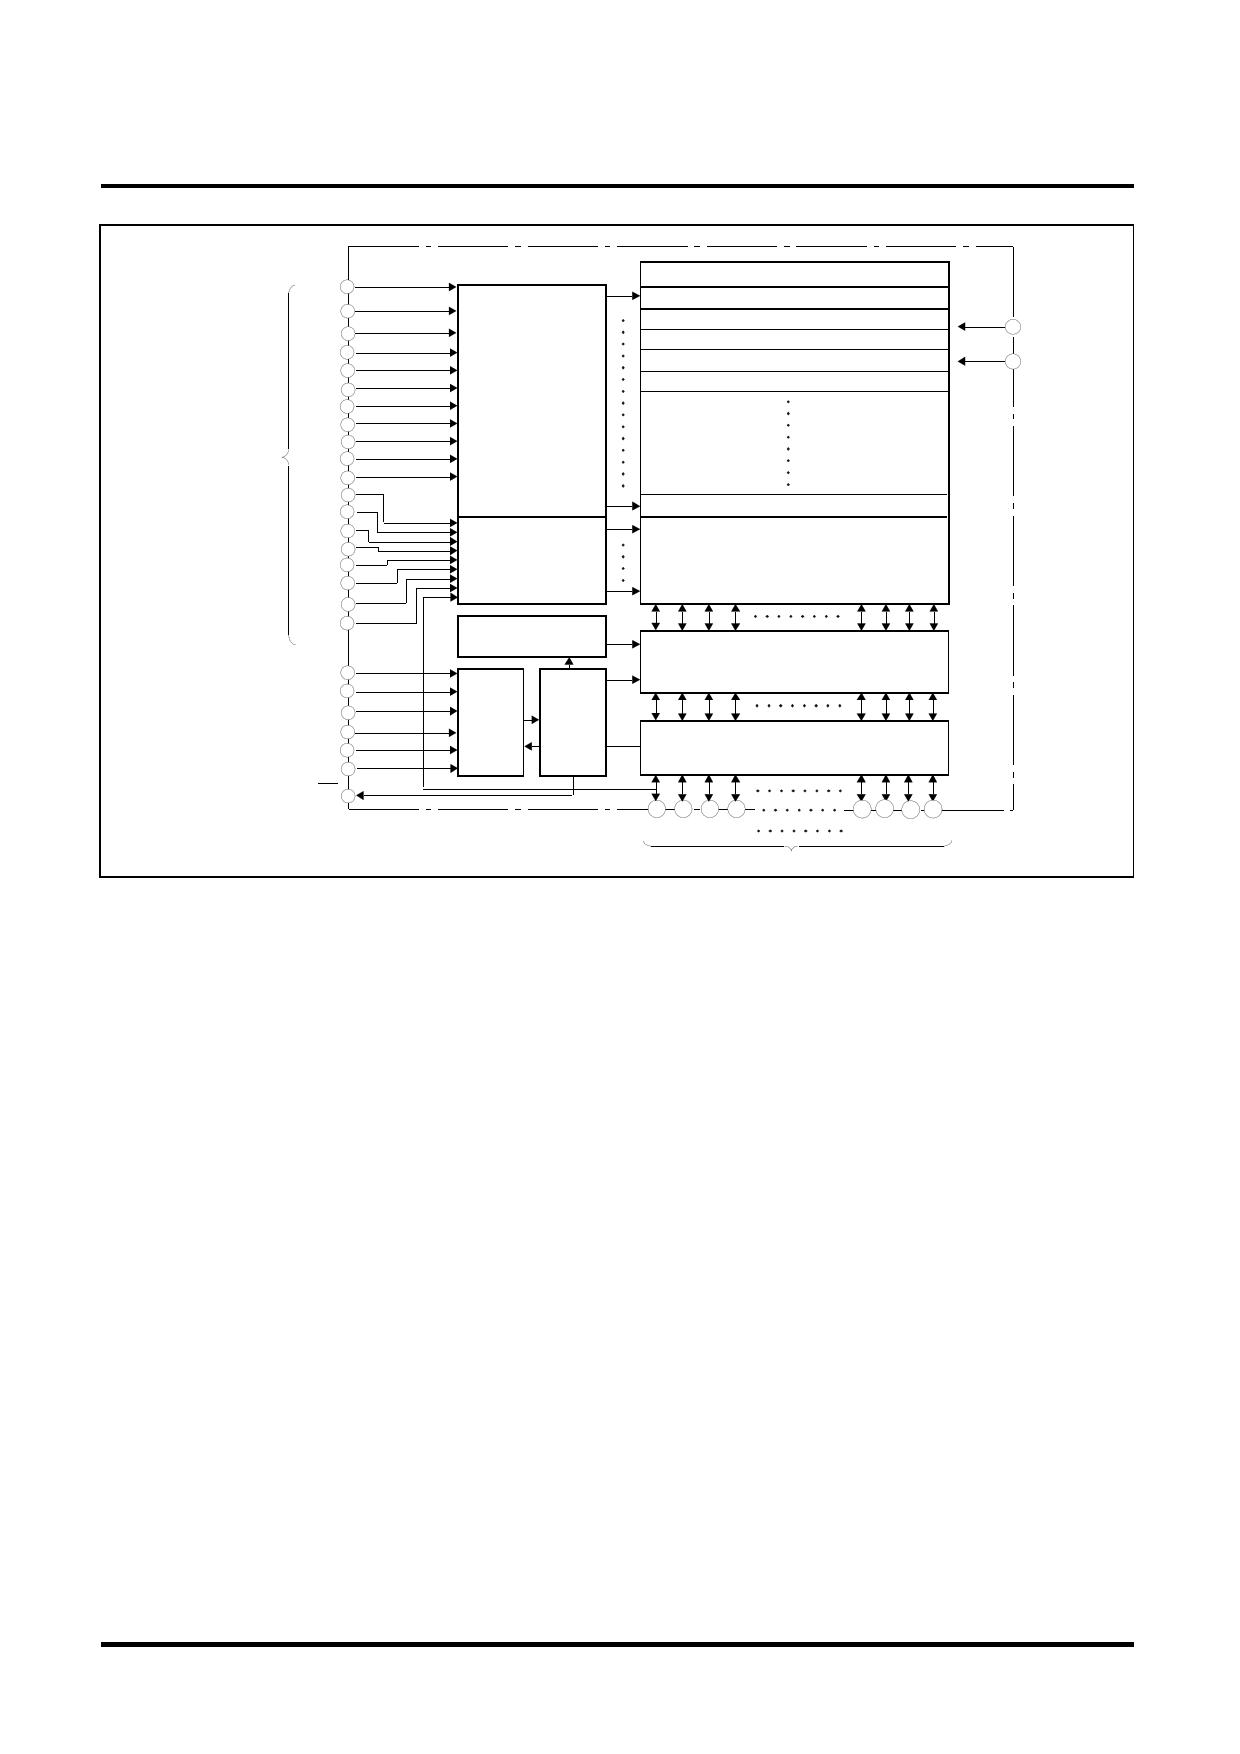 M5M29FT800VP-80 pdf